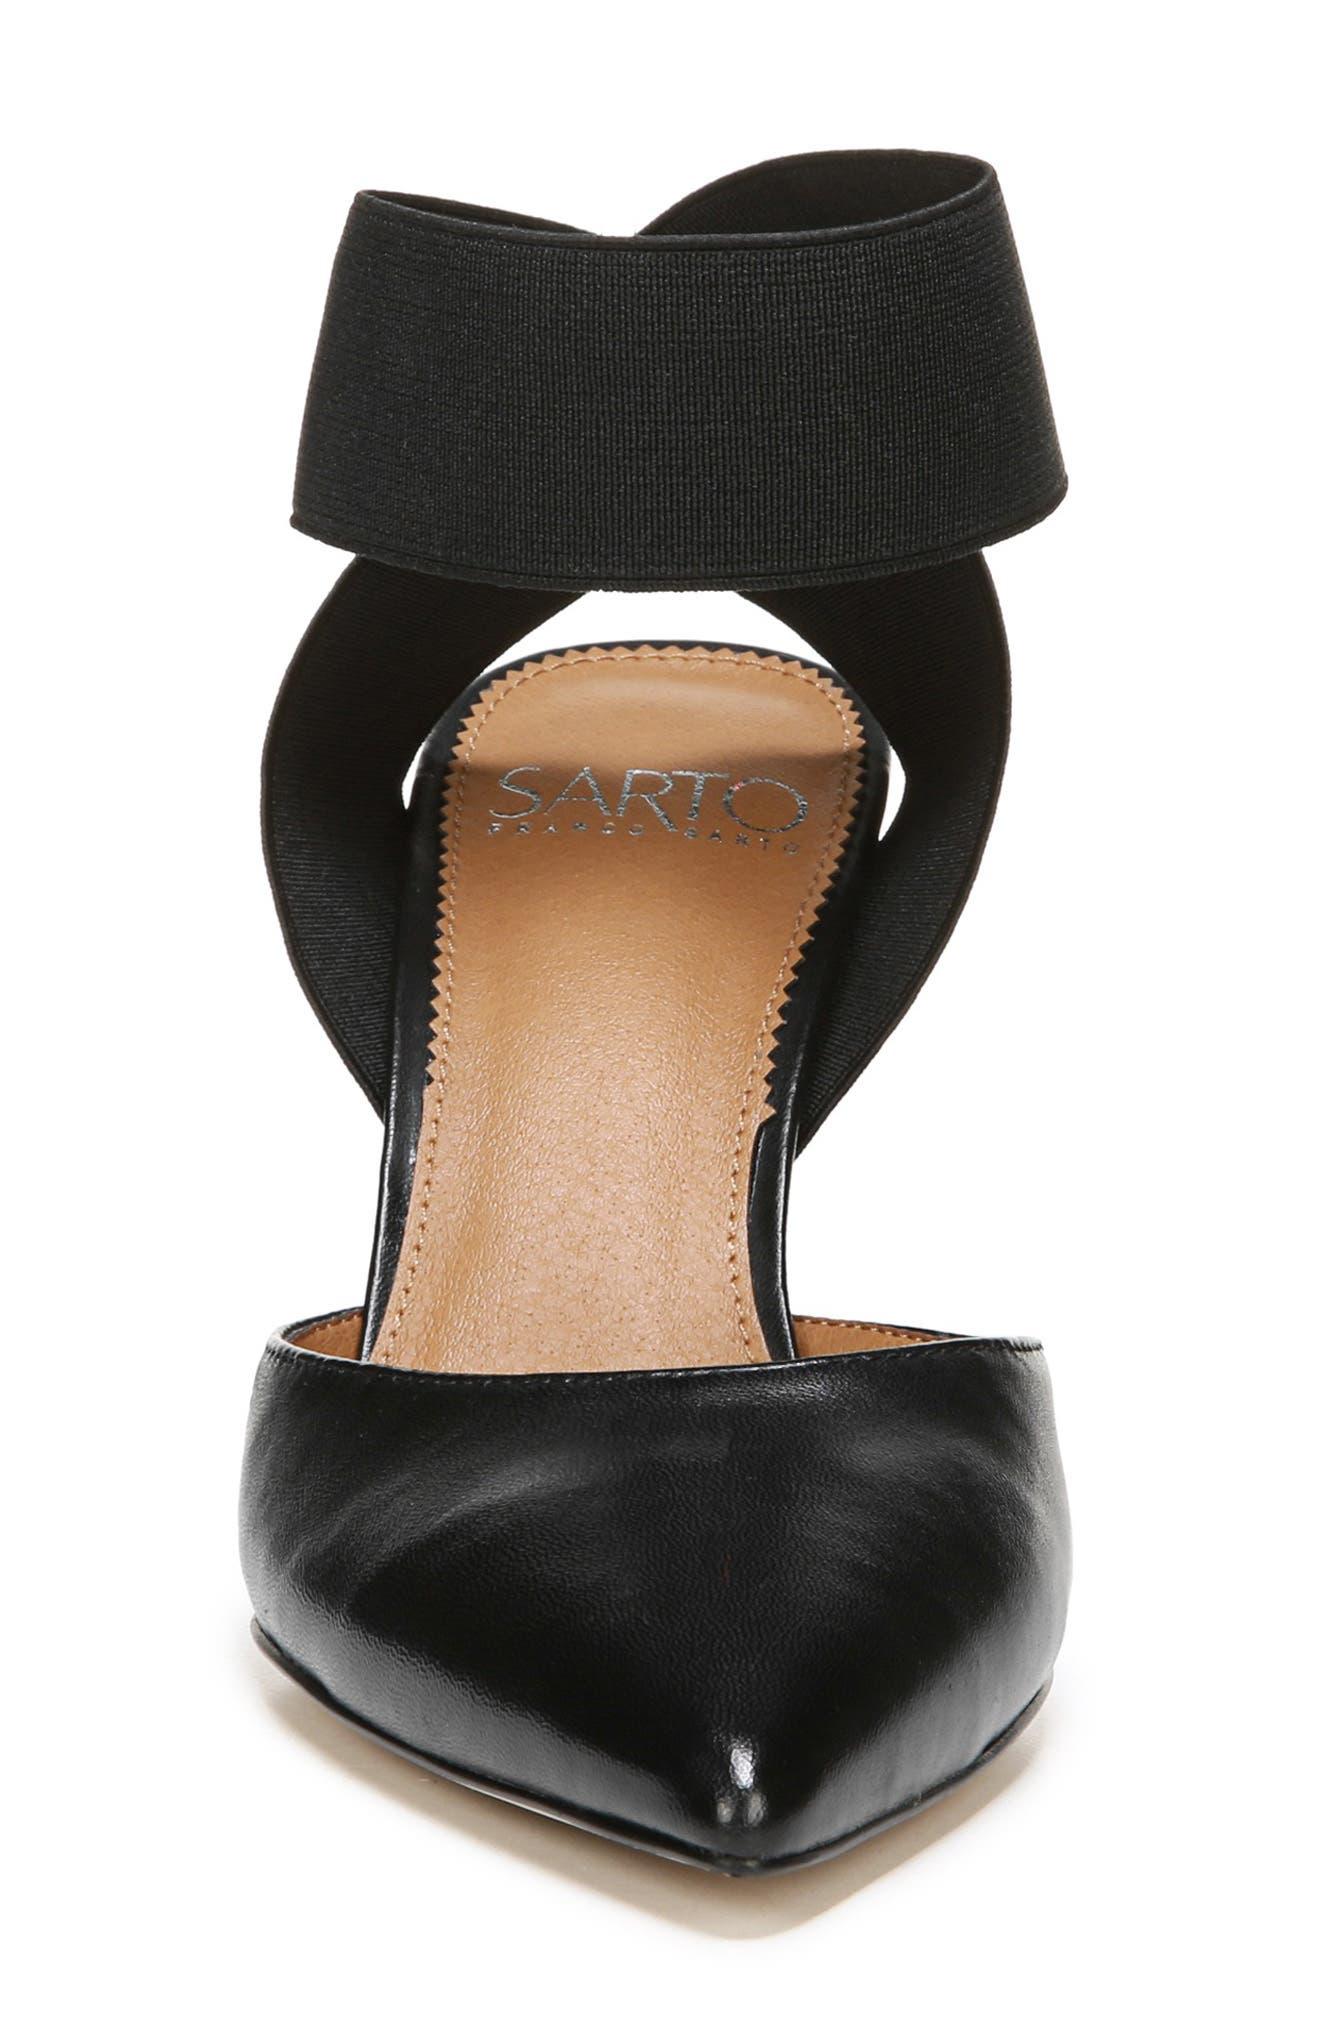 SARTO BY FRANCO SARTO, Stella Ankle Wrap Pump, Alternate thumbnail 4, color, BLACK LEATHER